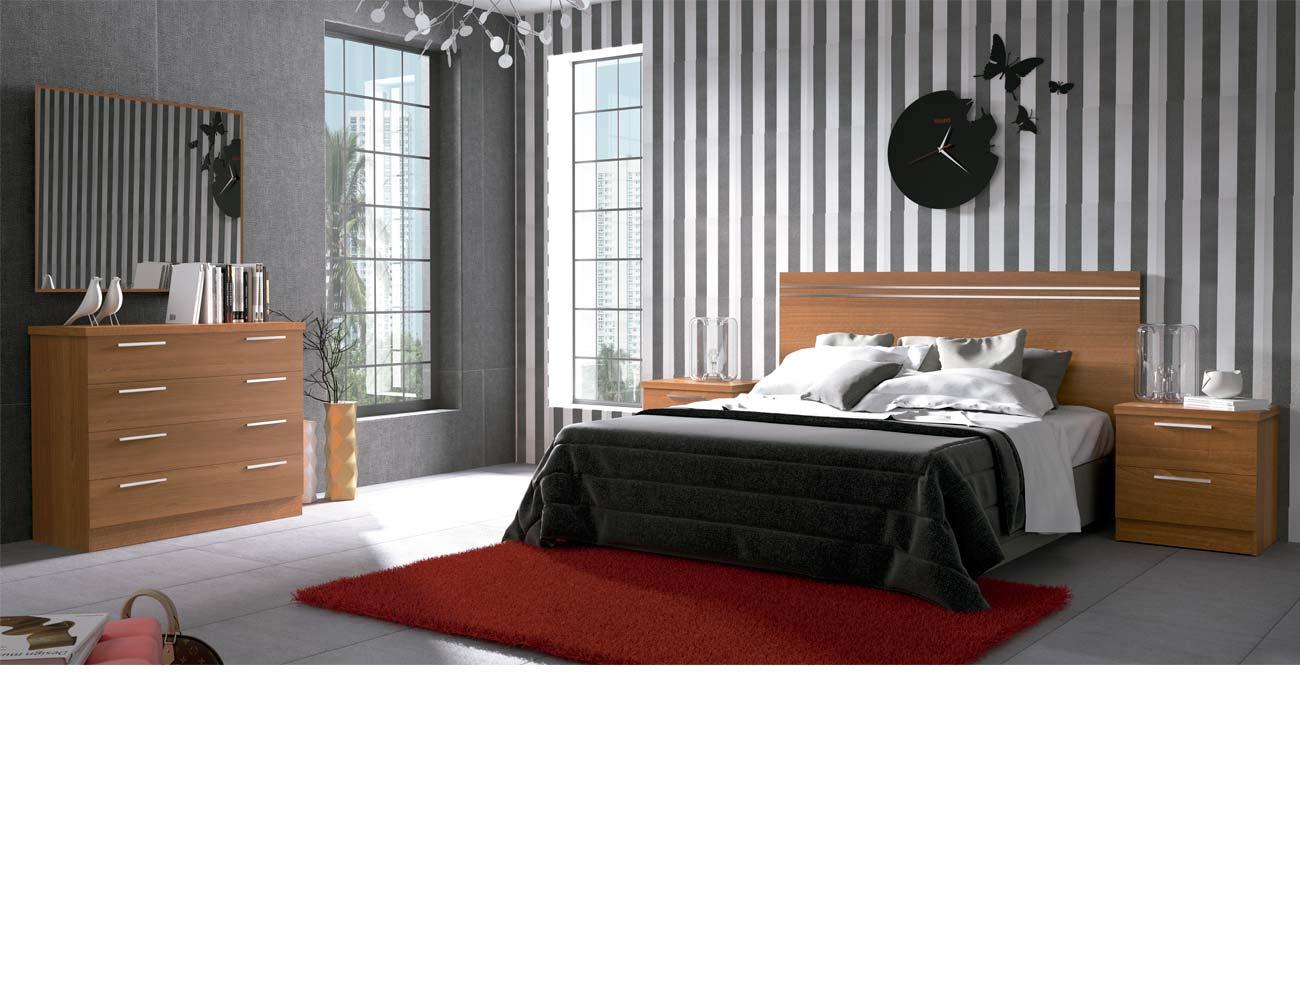 Dormitorio matrimonio moderno 40 walnut